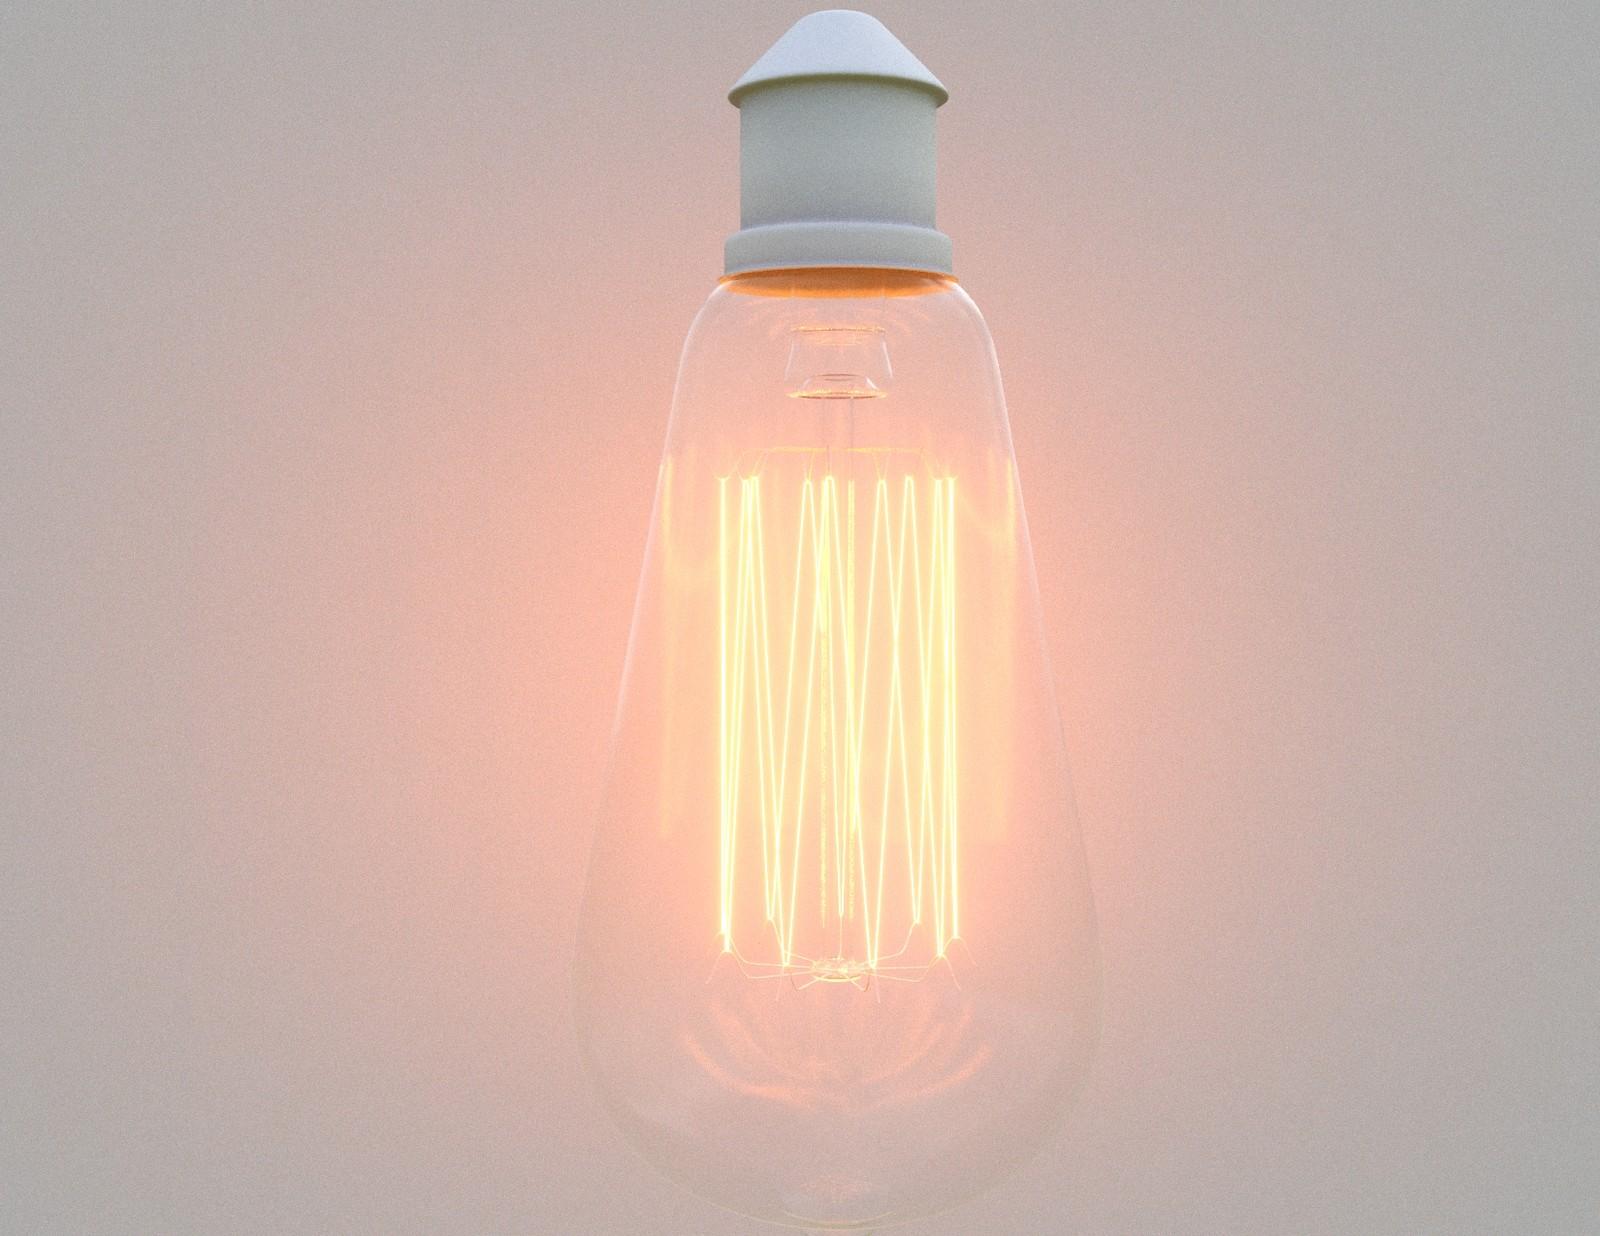 Incandescent Light Test 02. LightMtl - Intensity=500. Temp=2700K. Glass - Refraction=1. Color=255. Glossiness=1. IOR=1.52.  Reflection=1. Color=96. Glossiness=0.9. FrIOR=1.52. Bloom=5. Glare=0.1